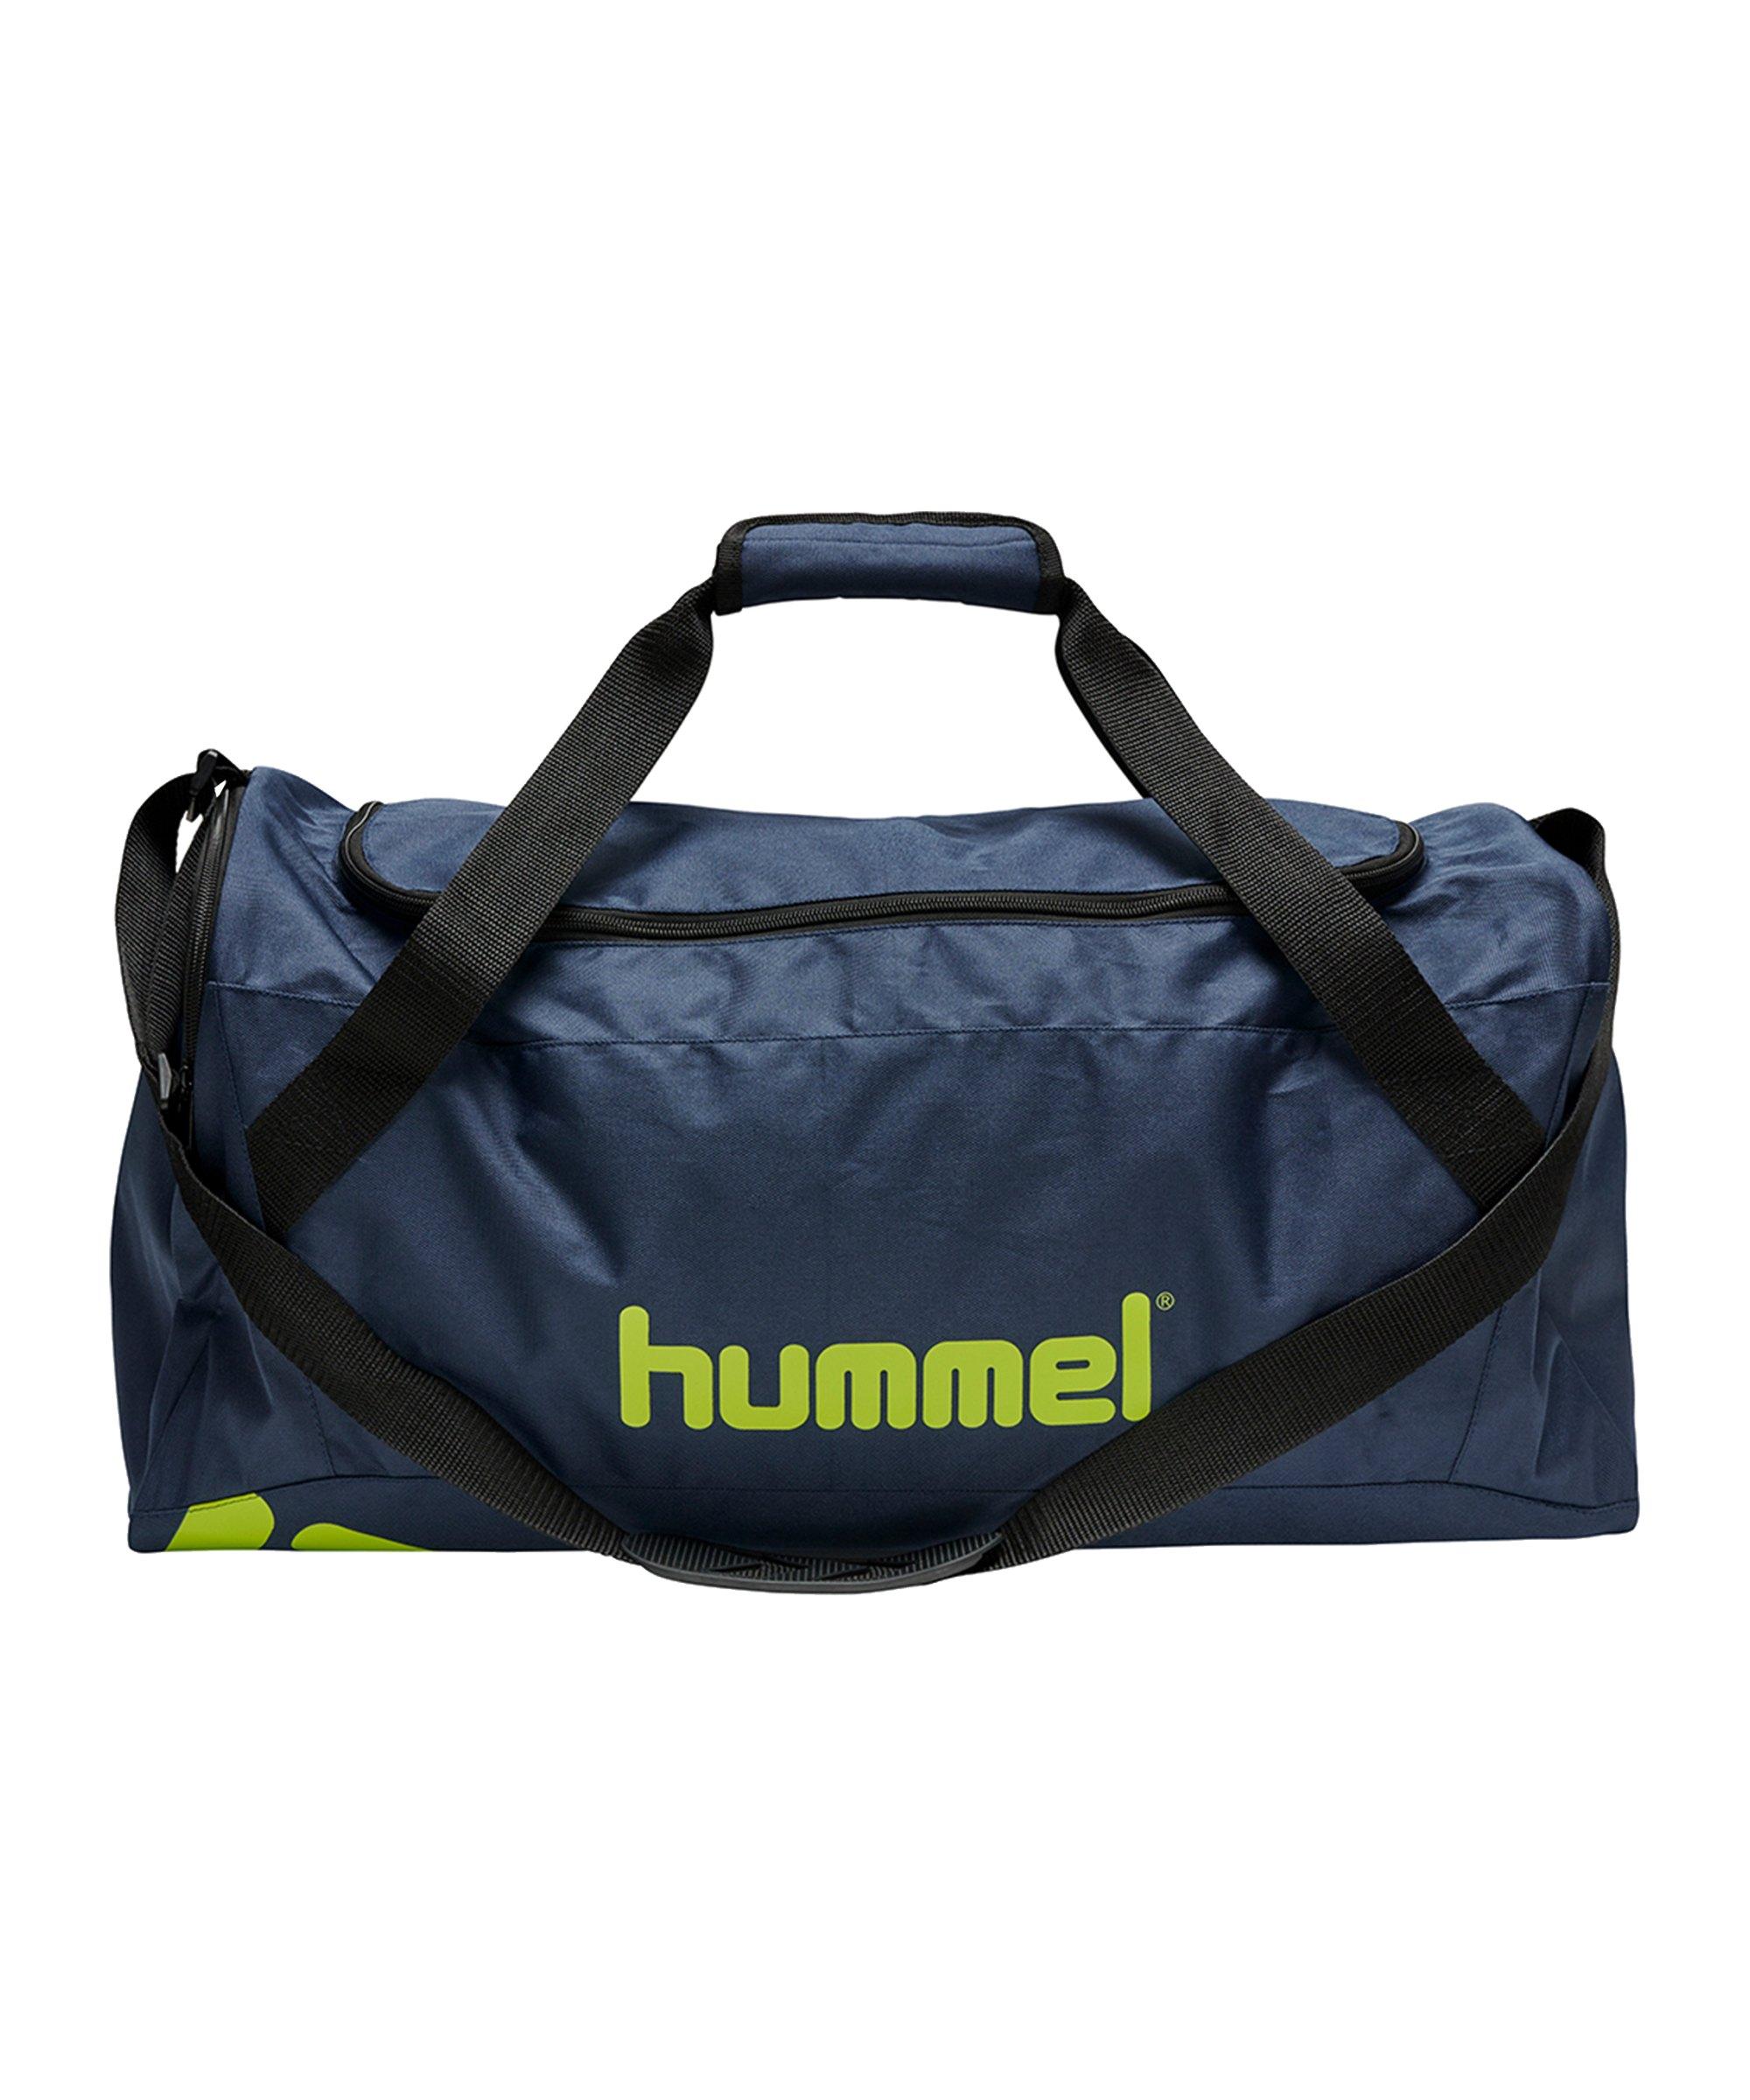 Hummel Core Bag Sporttasche Blau F6616 Gr. M - blau